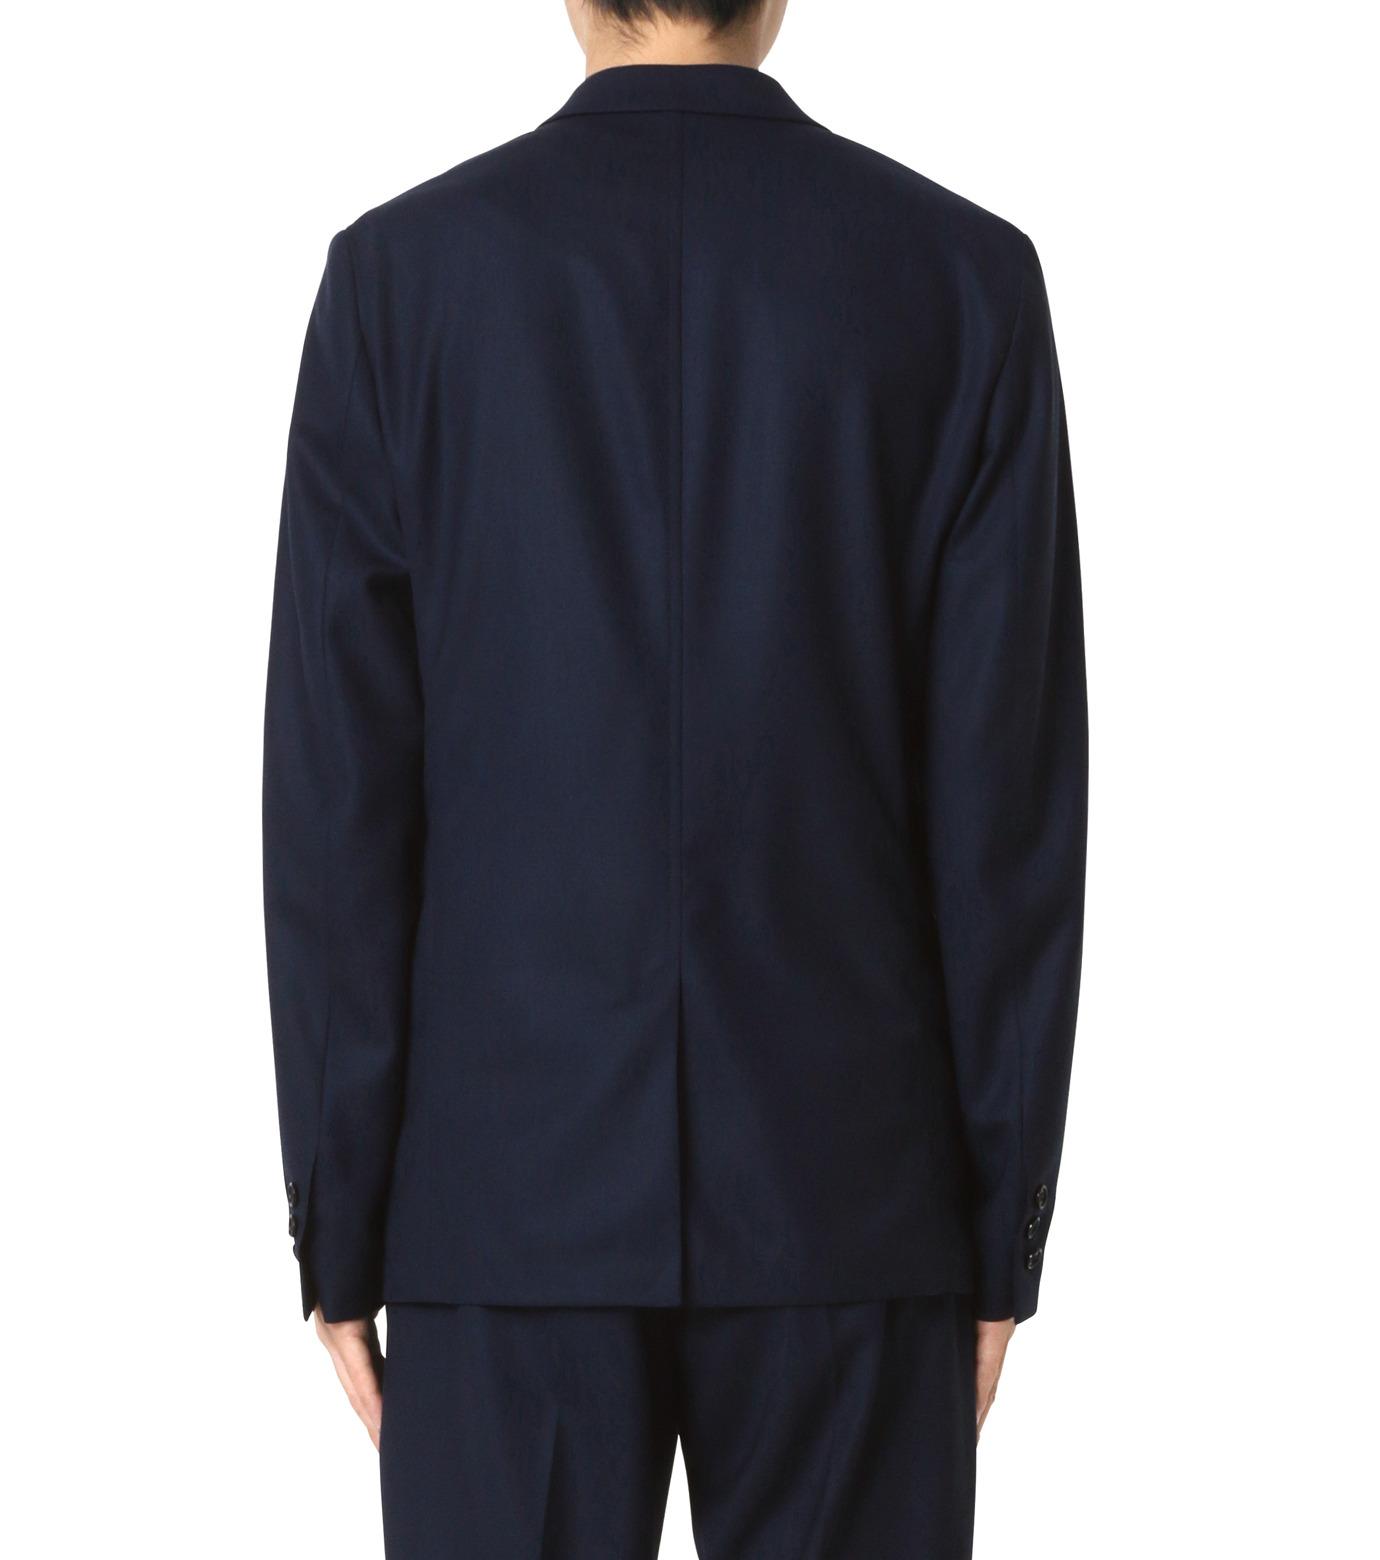 ACNE STUDIOS(アクネ ストゥディオズ)のBasic Jacket-NAVY(ジャケット/jacket)-2BA156-93 拡大詳細画像2